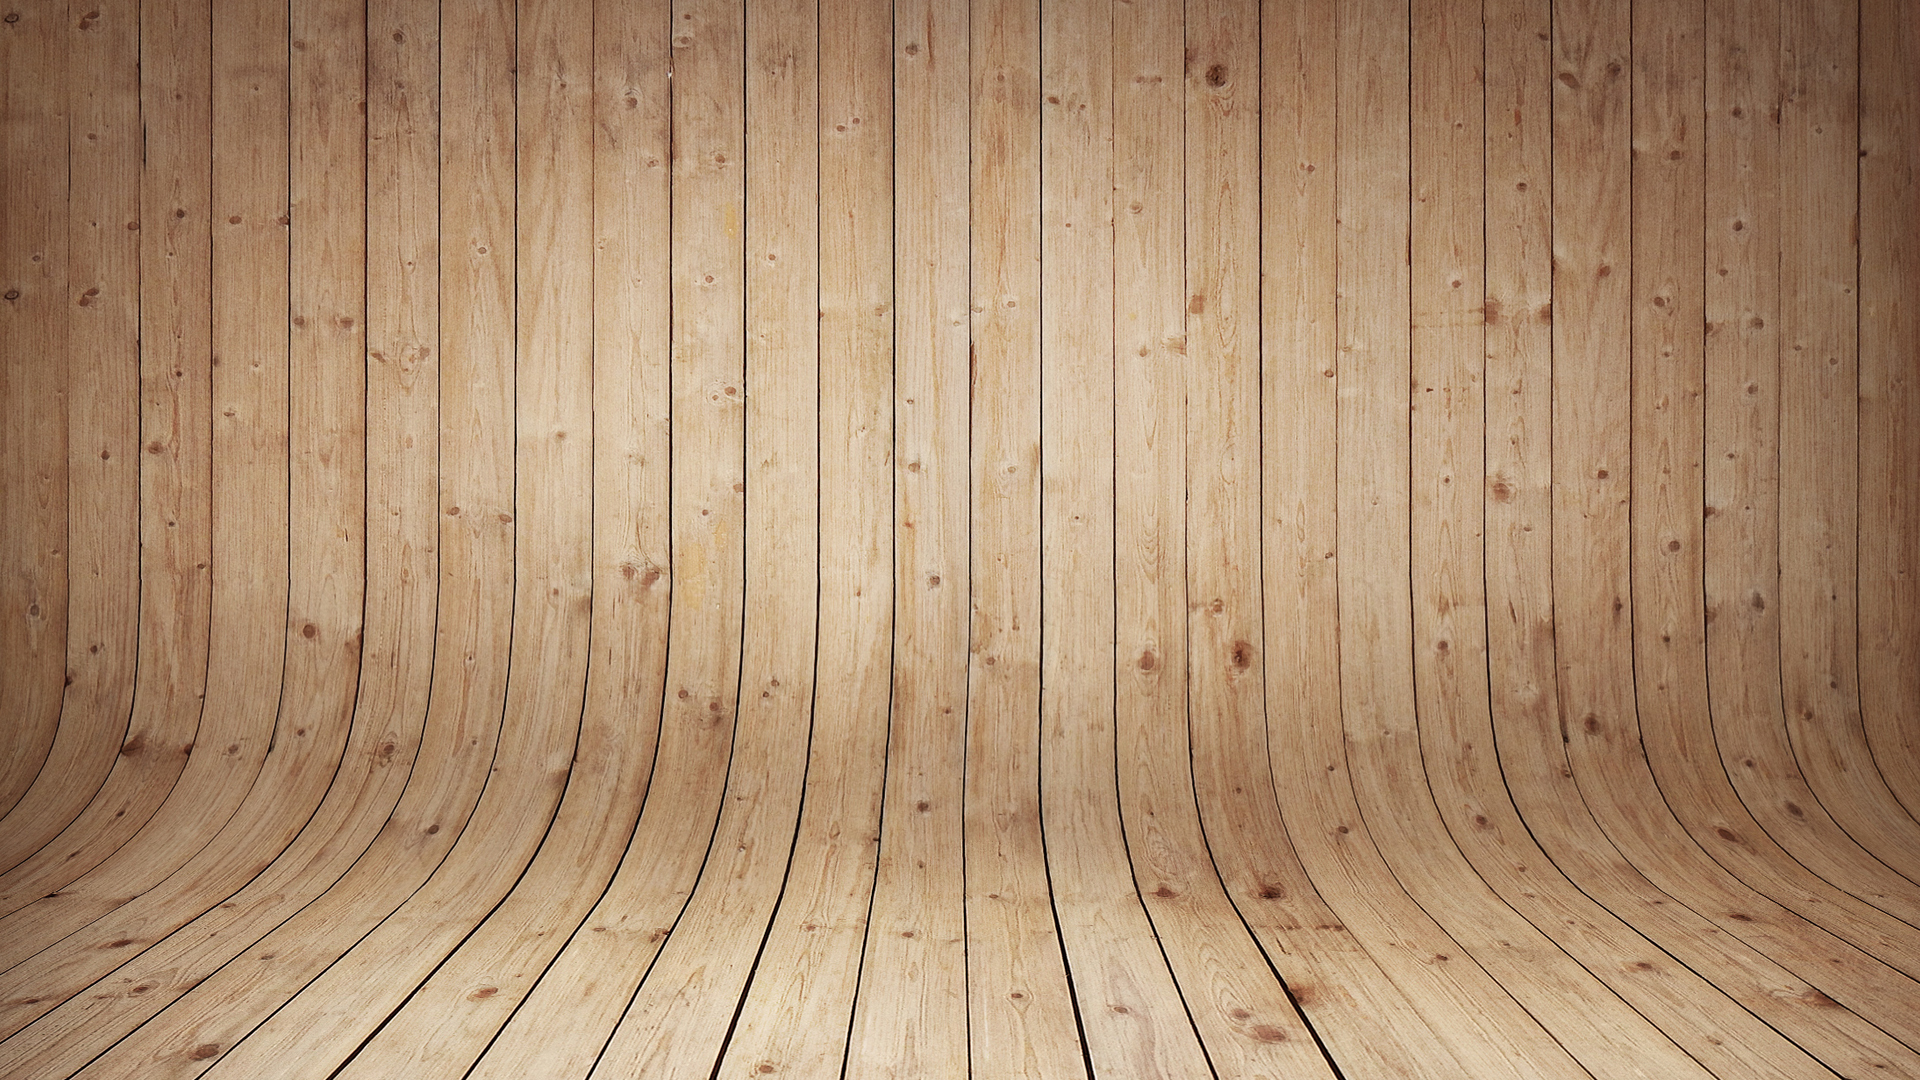 Desktop wood wallpaper hd downloadwallpaper desktop wood wallpaper hd 1920x1080 1 1024x576 voltagebd Choice Image